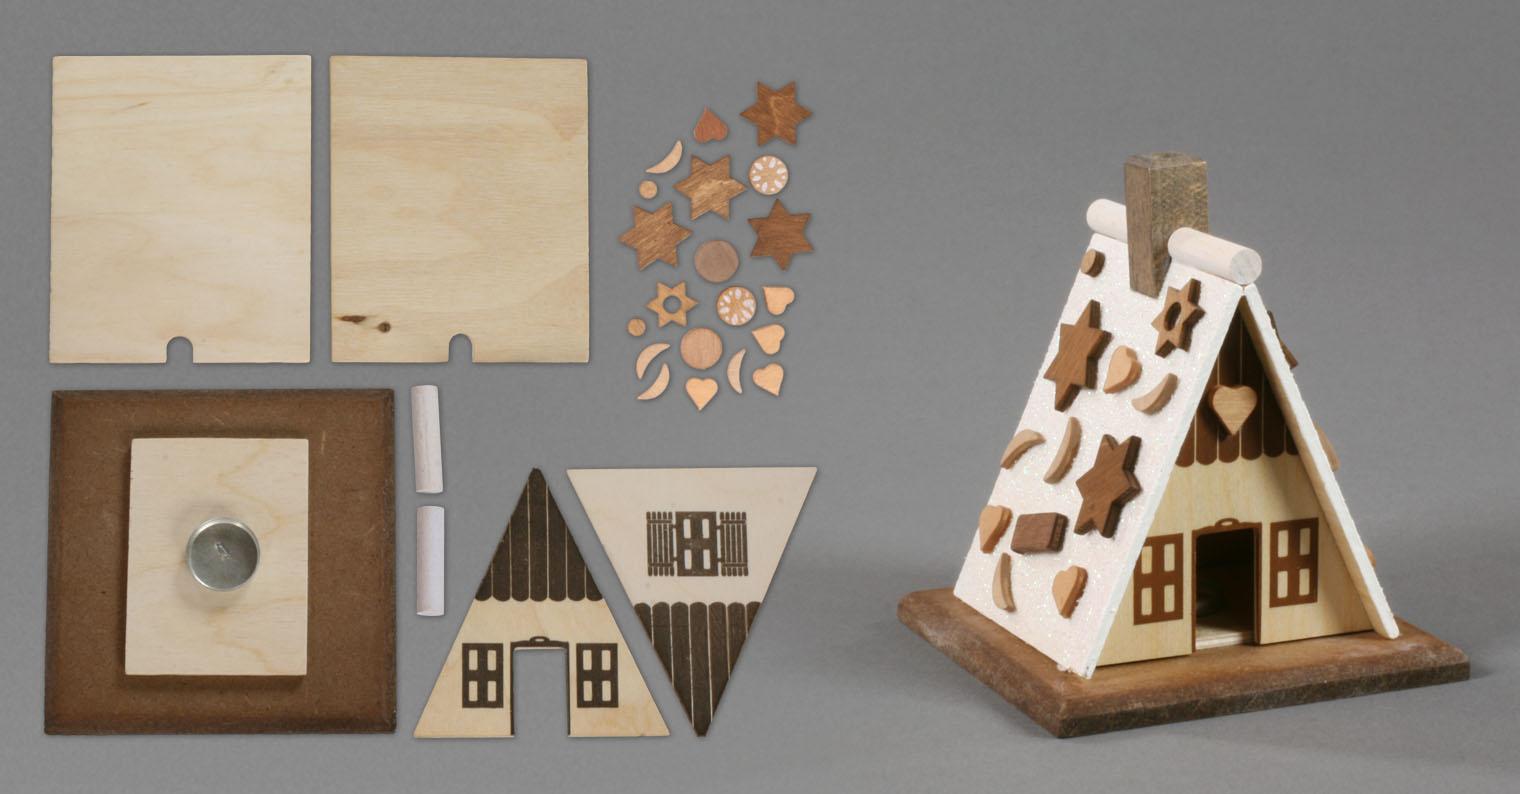 bastelsatz knusperhaus bastelsets aus holz weitere spielwaren online shop reifra. Black Bedroom Furniture Sets. Home Design Ideas